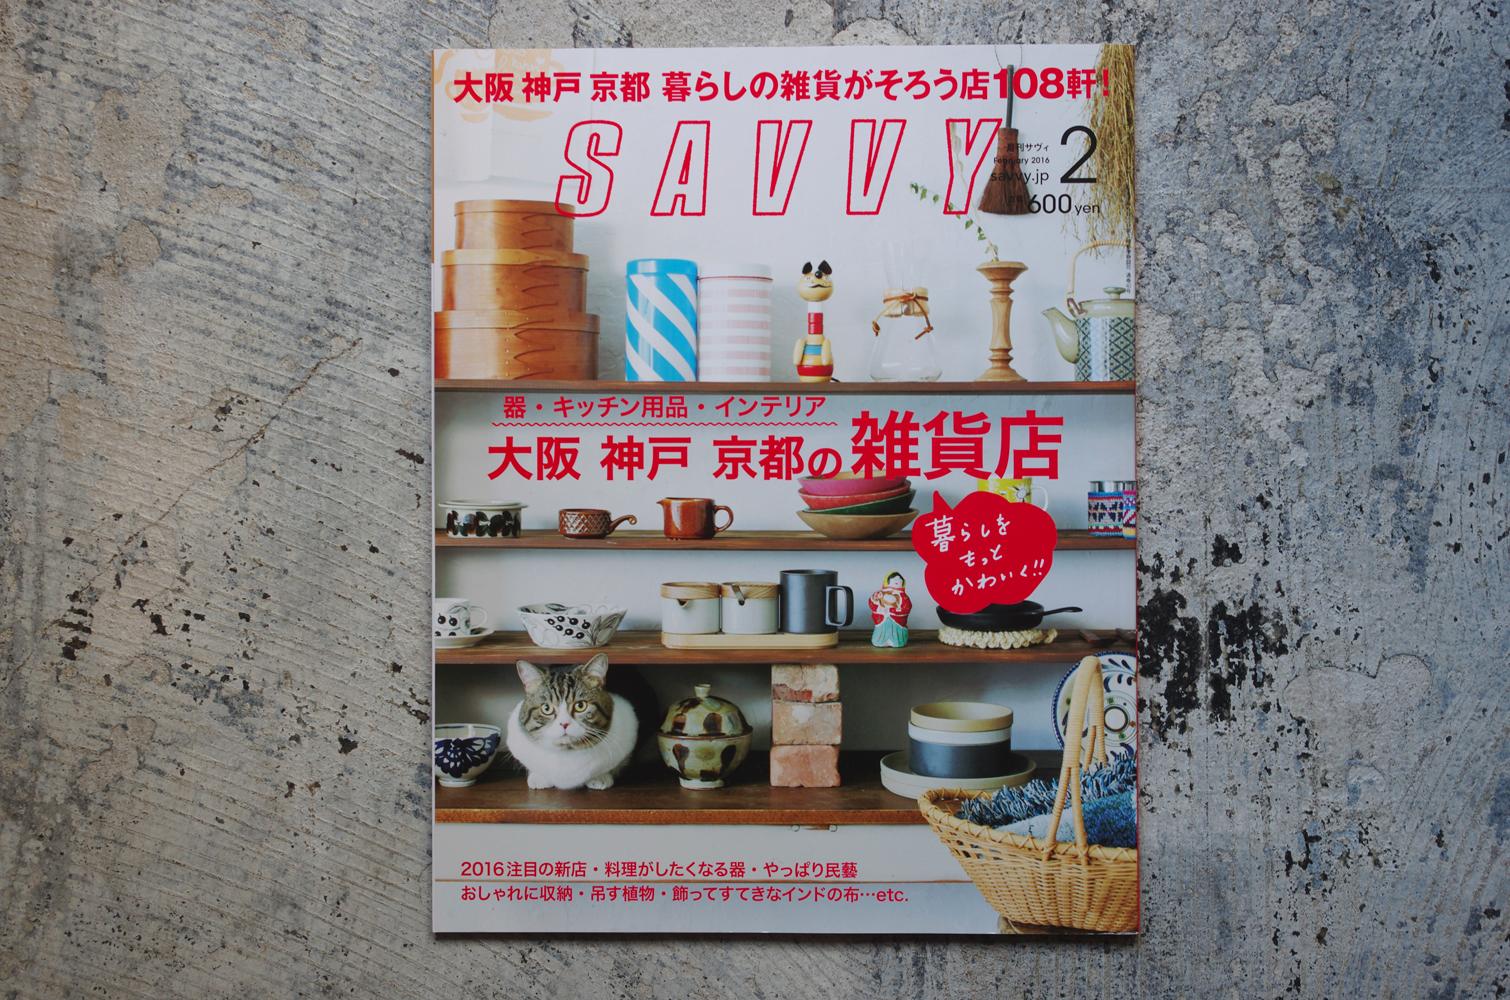 SAVVY 16.01